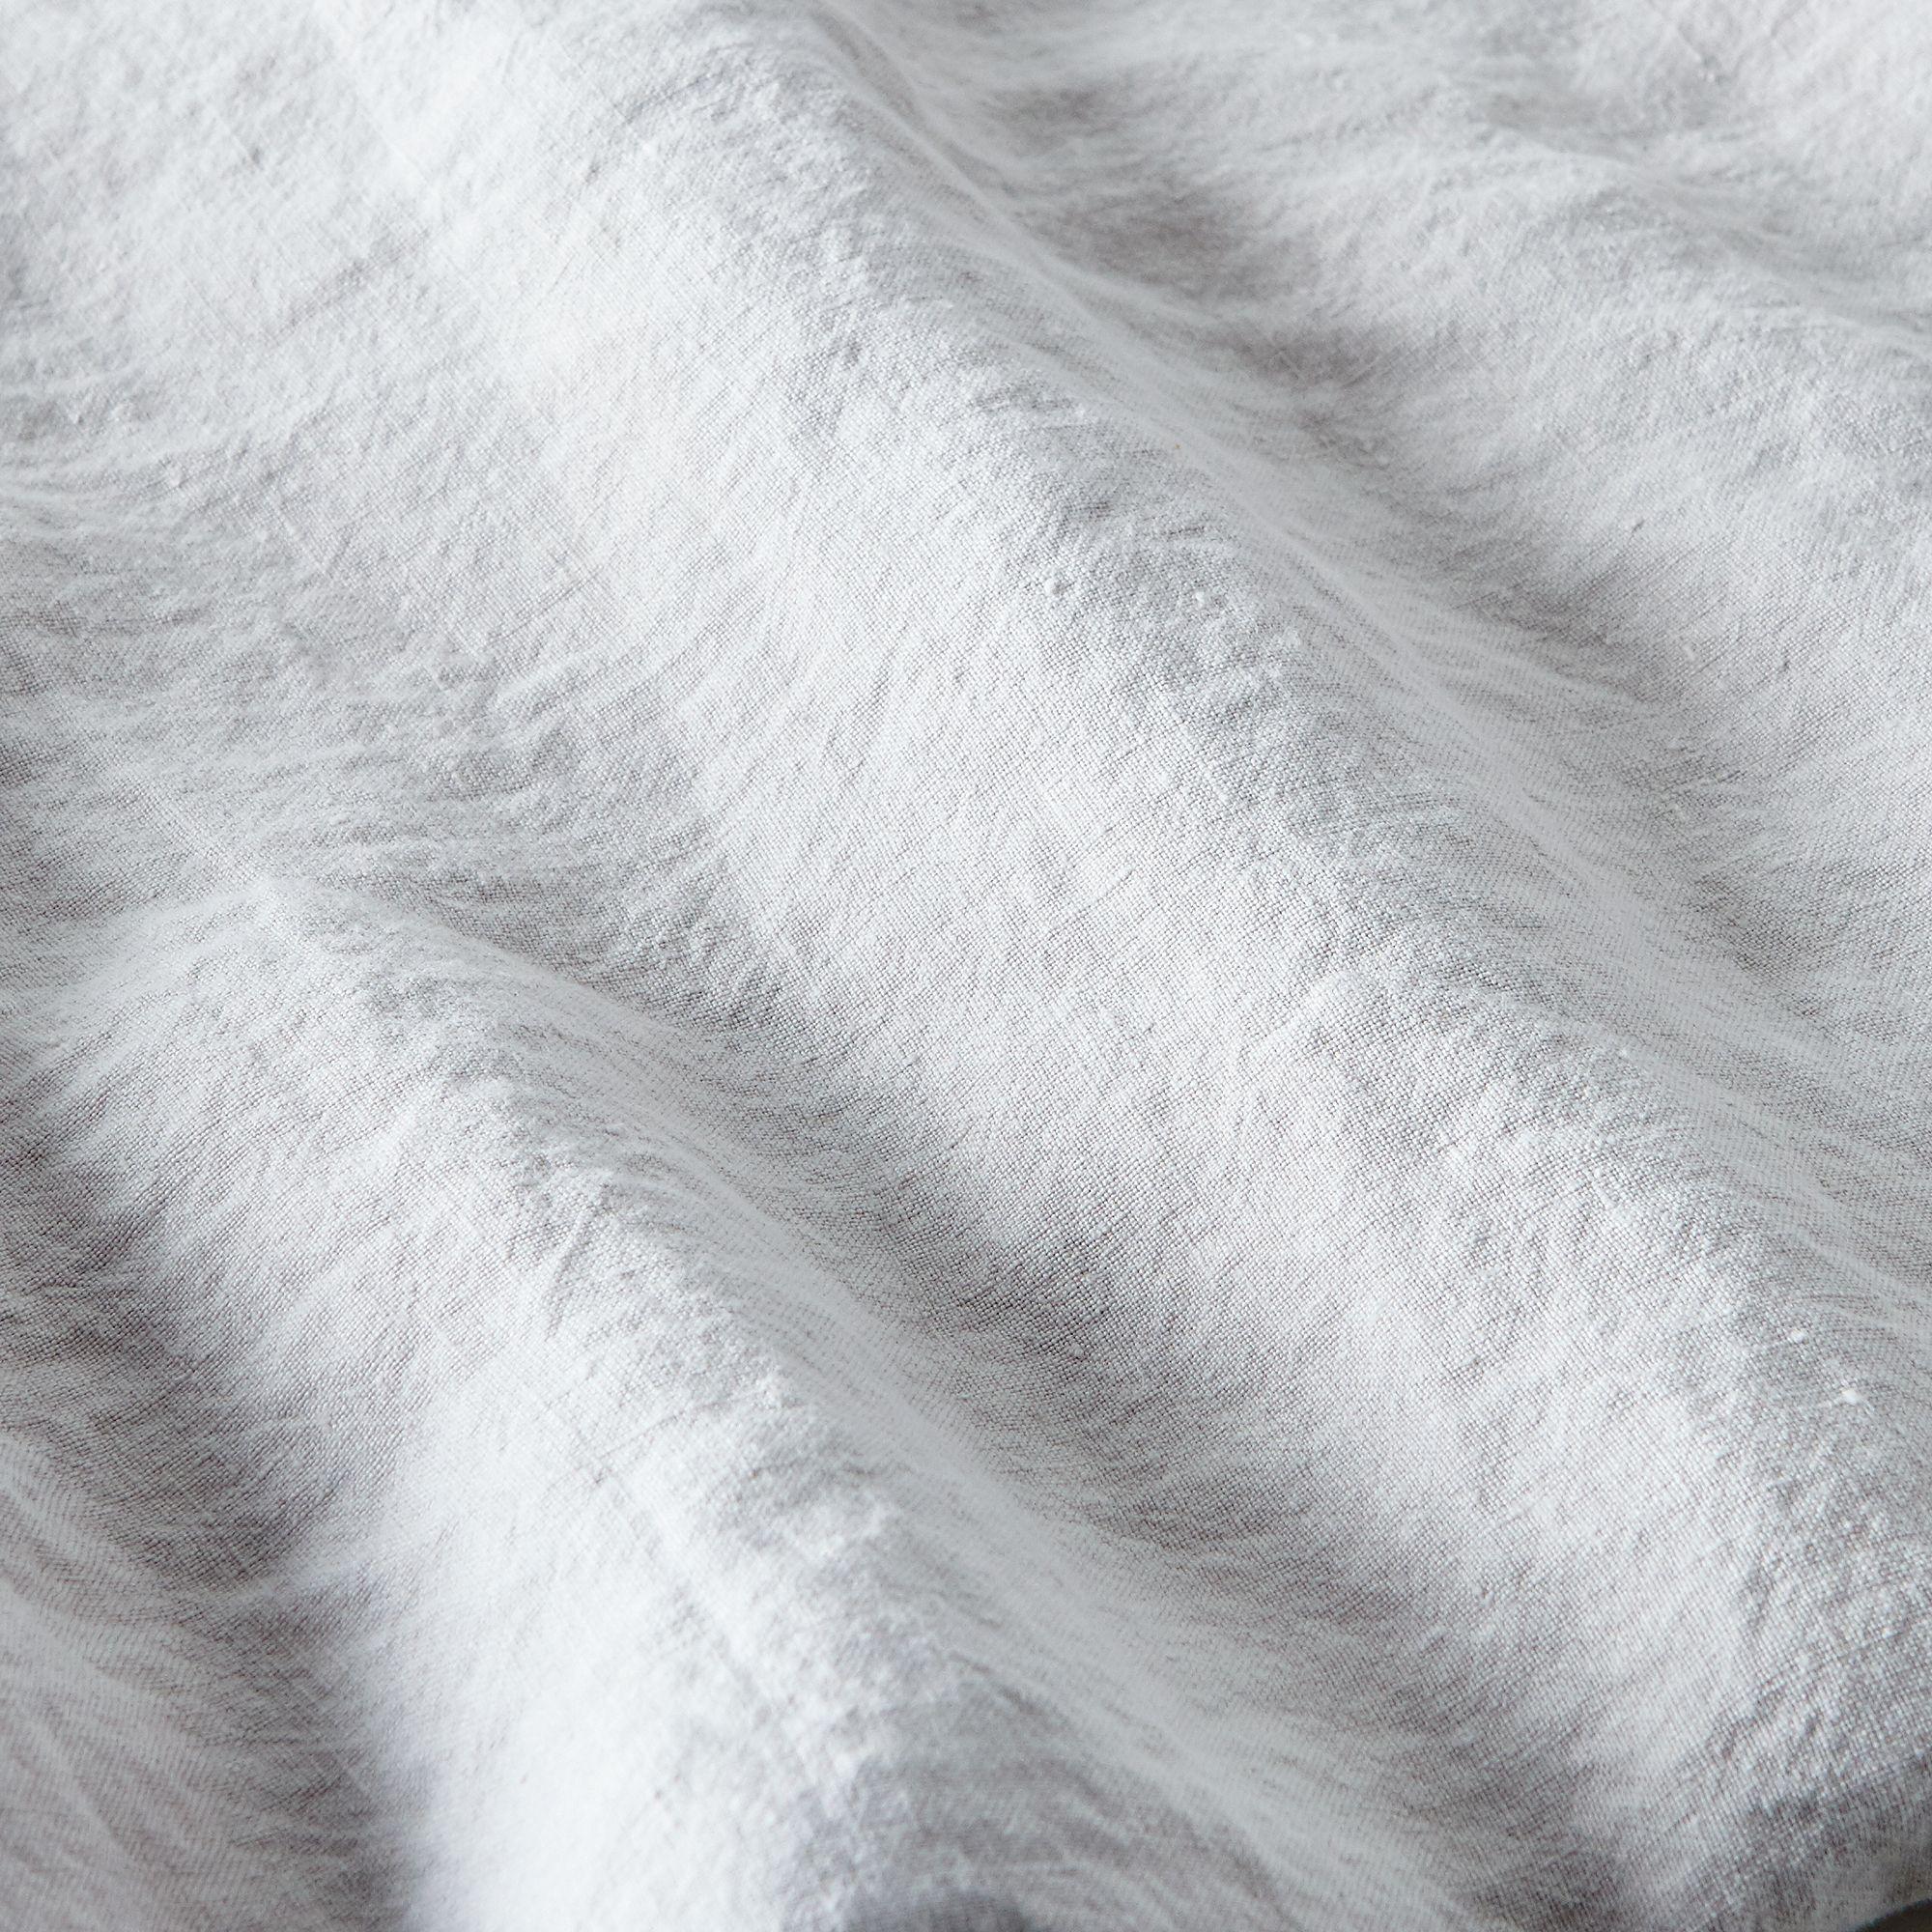 0805243e a0f9 11e5 a190 0ef7535729df  2015 1008 hawkins ny stonewashed linen bedding sheet light grey silo rocky luten 008